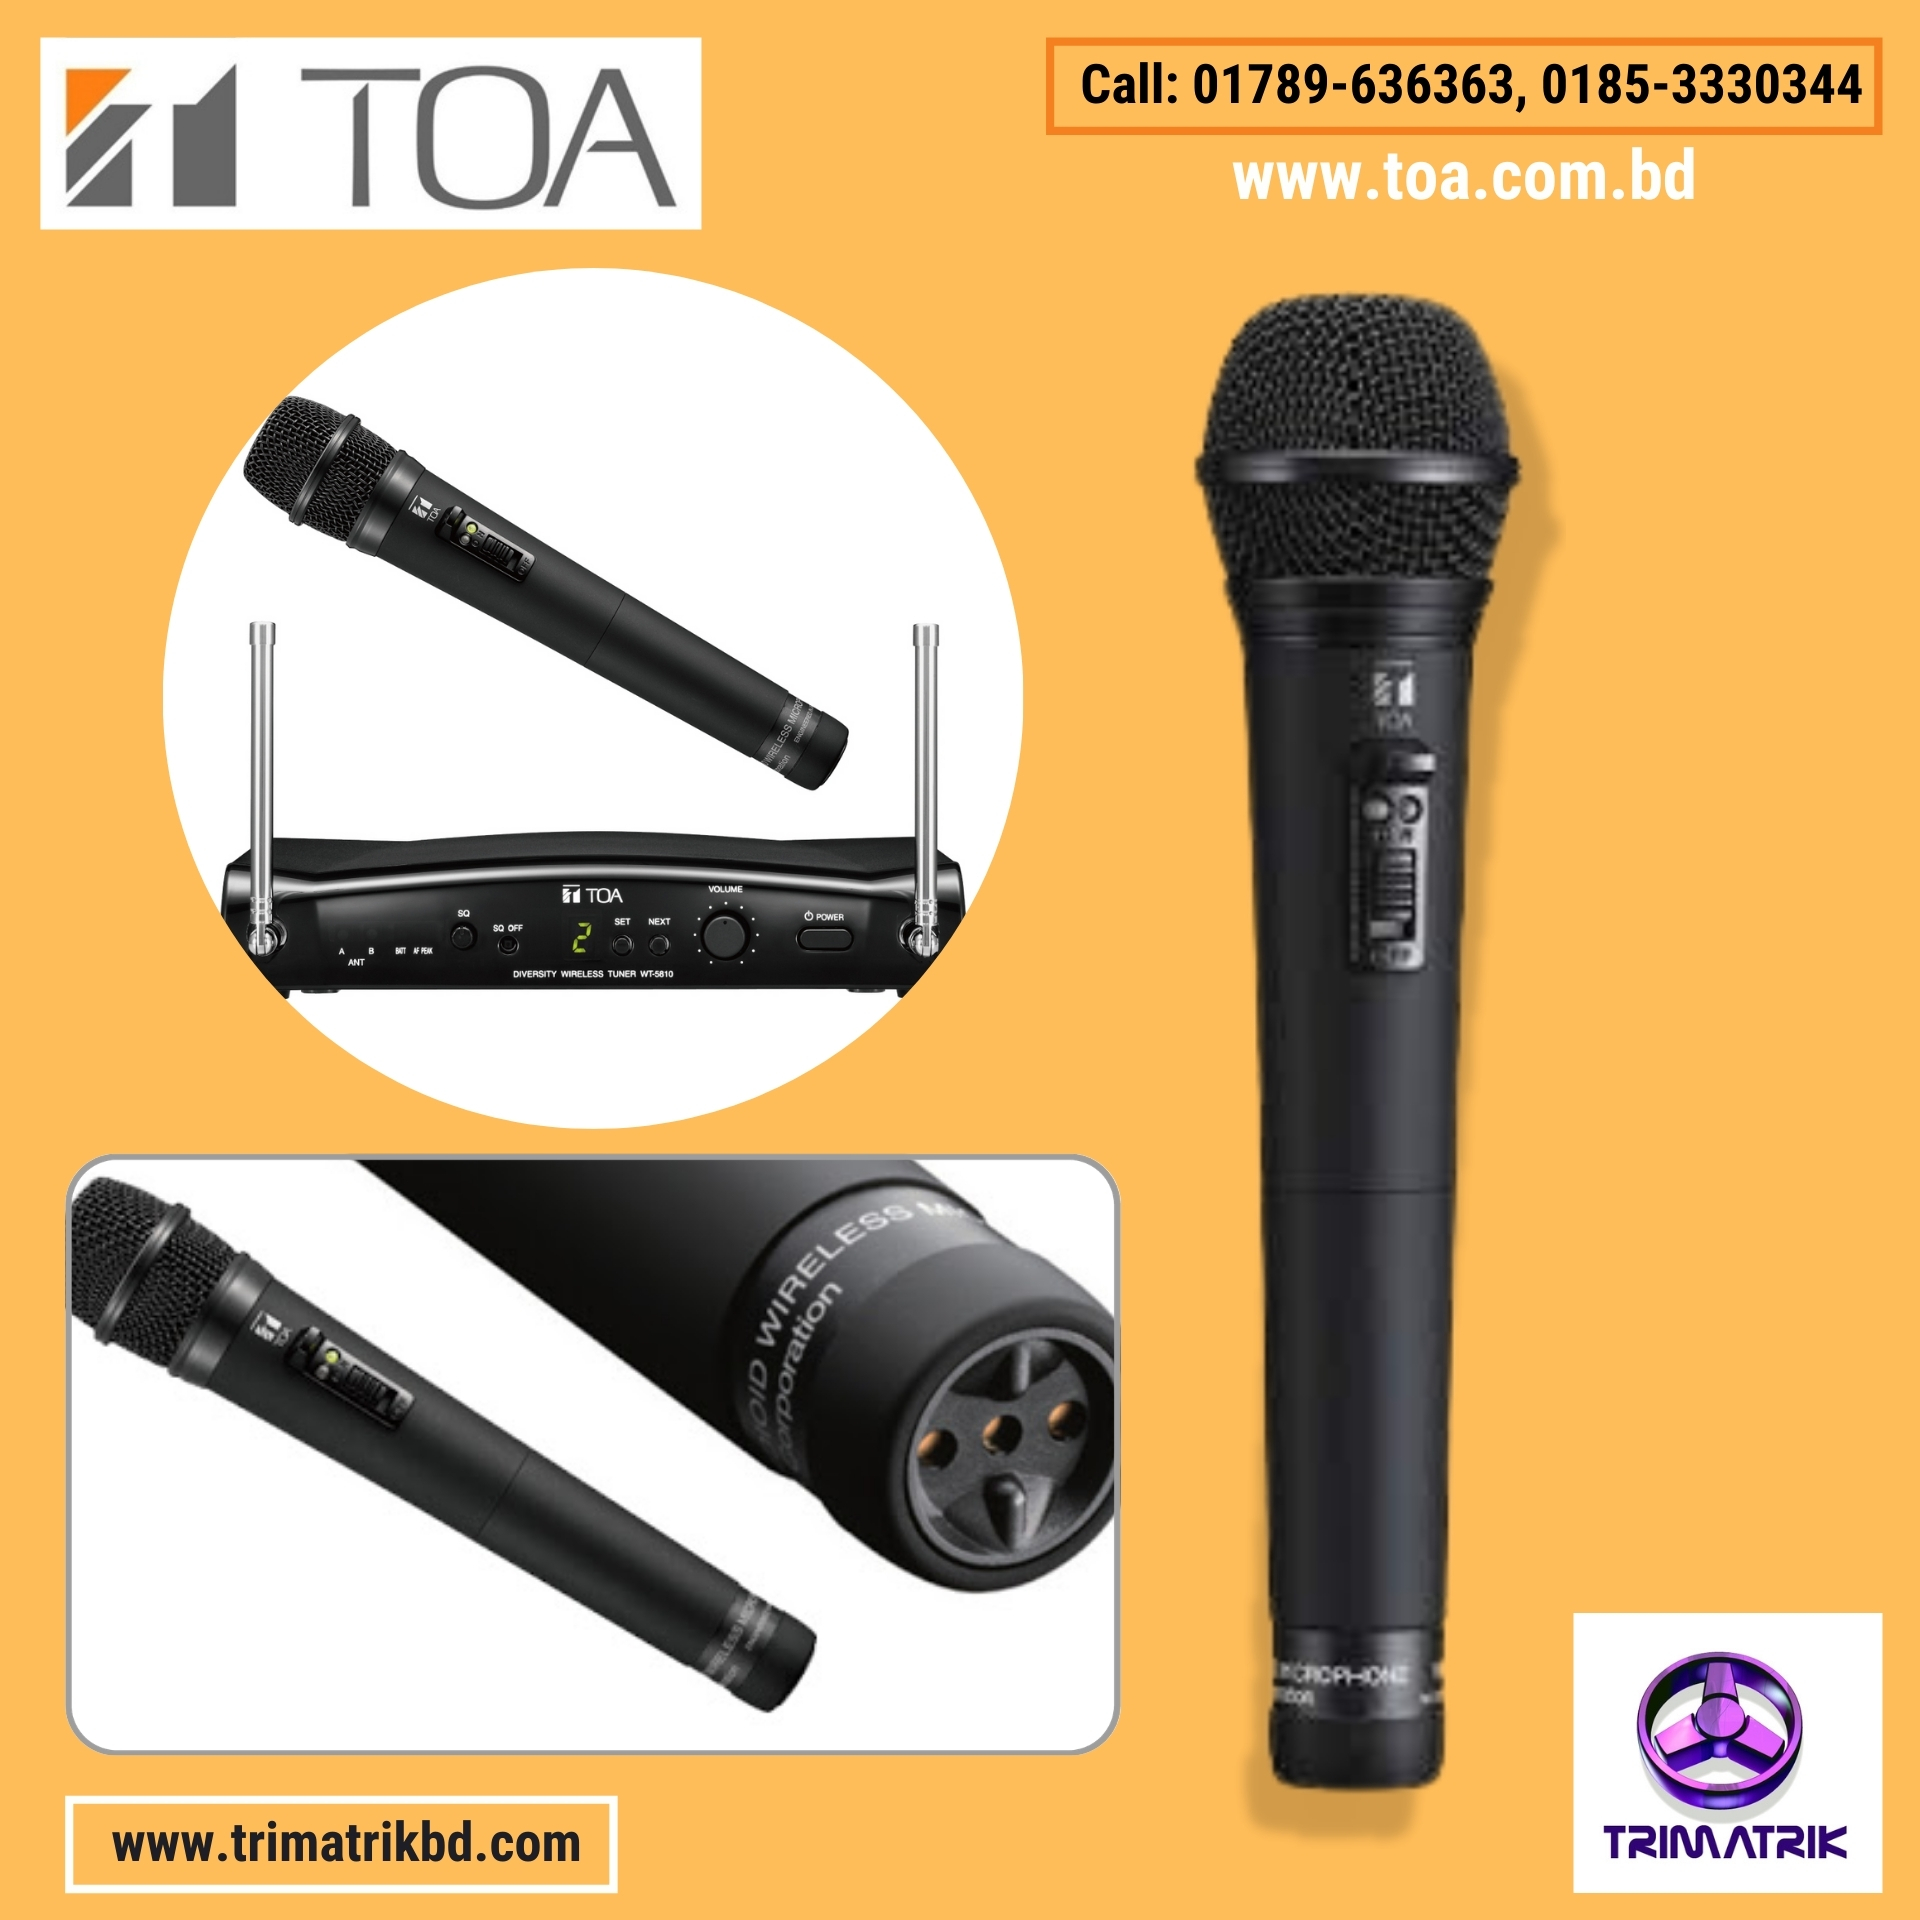 TOA WT-5810 Bangladesh